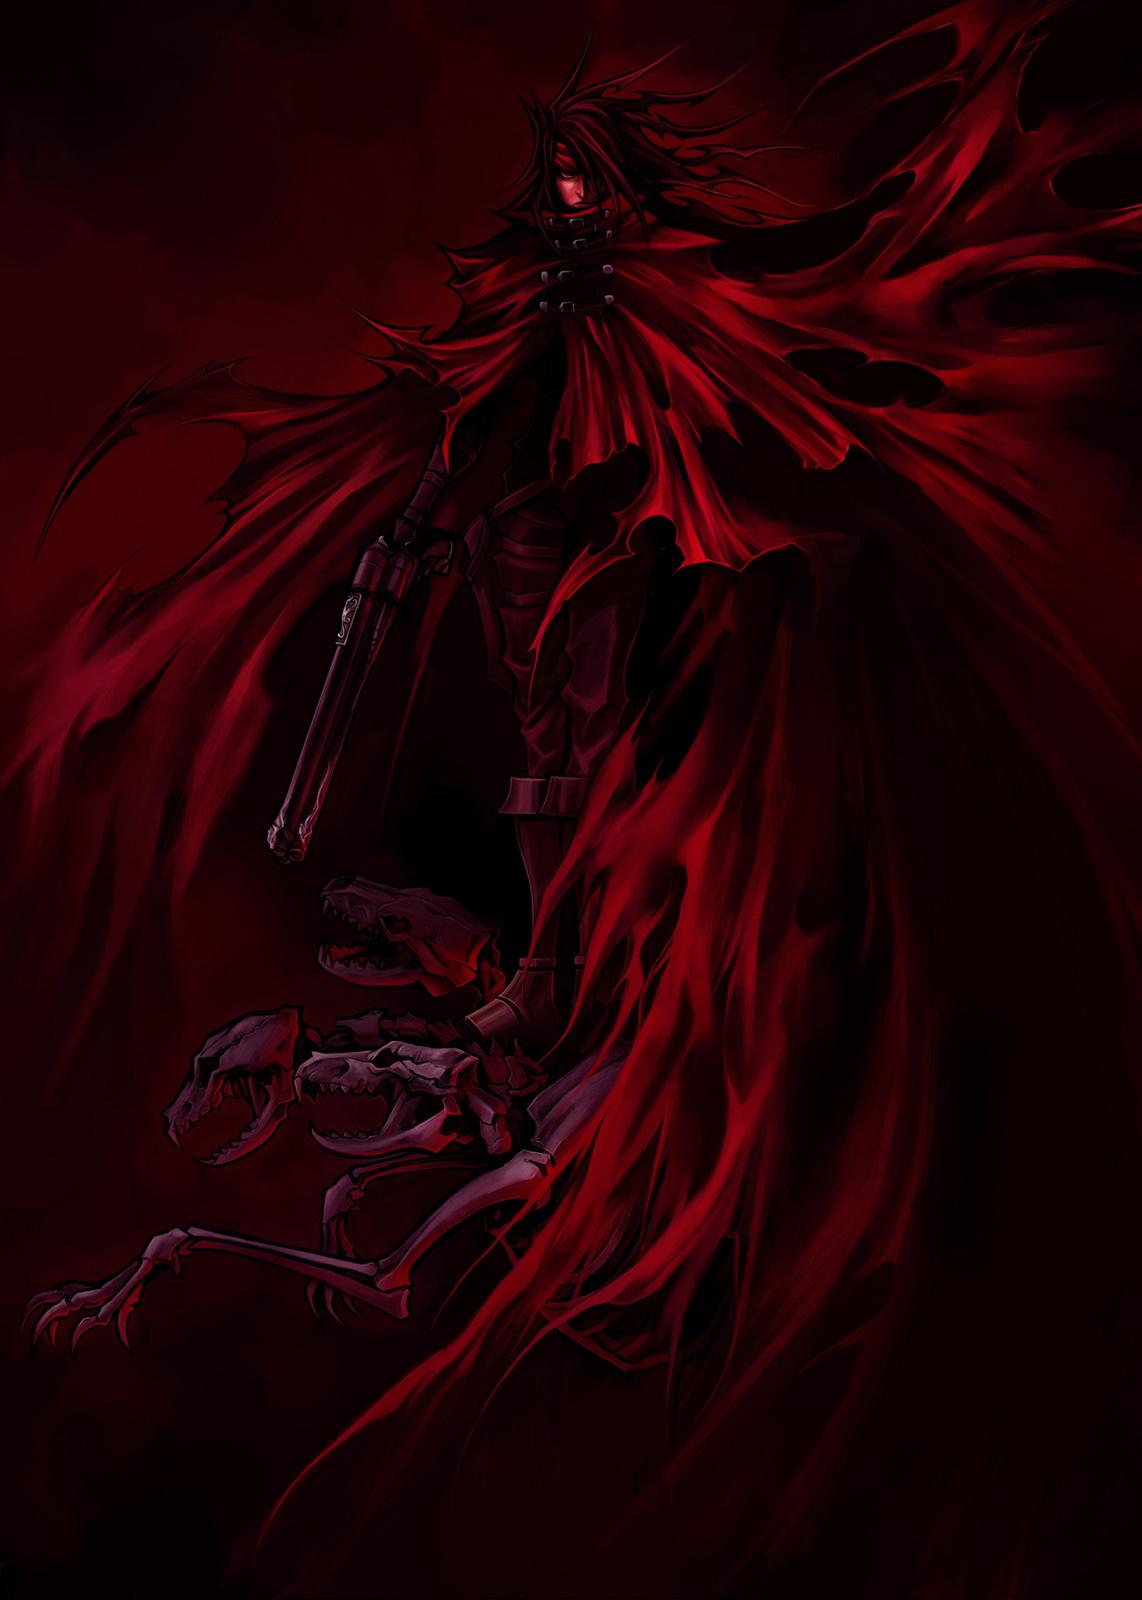 Dirge of Cerberus -Final Fantasy VII- concept art